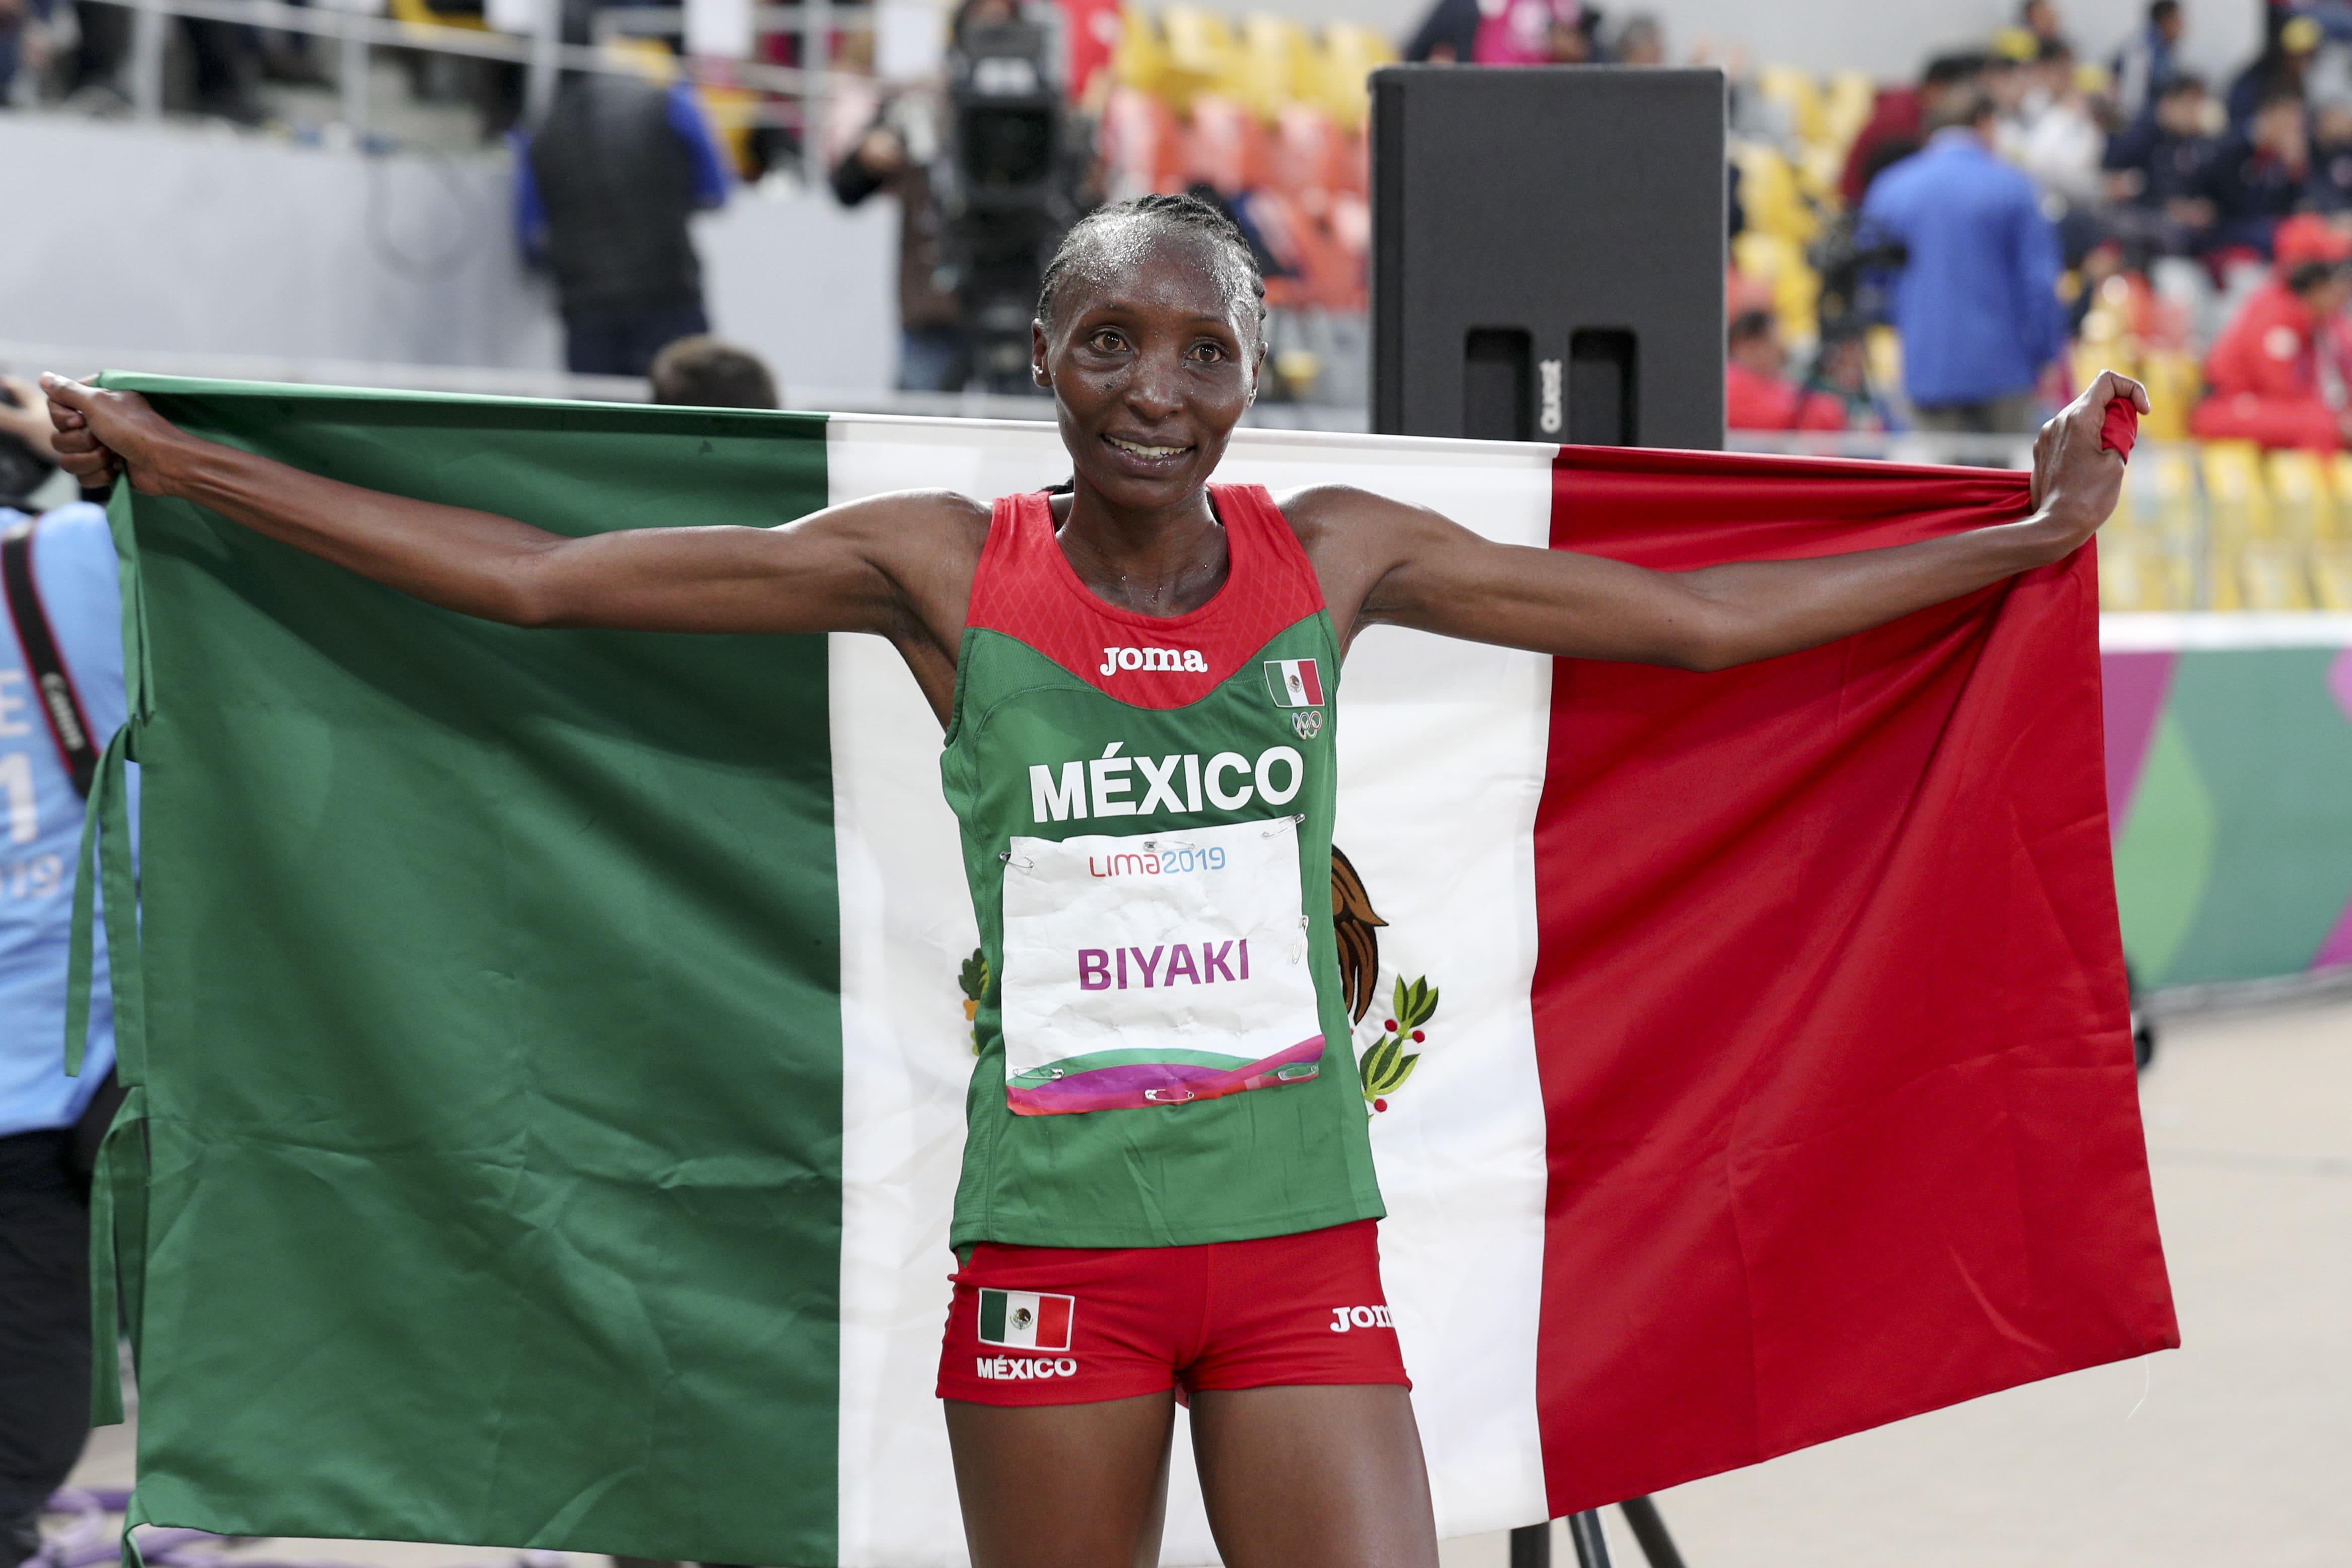 risper-biyaki-con-bandera-de-mexico